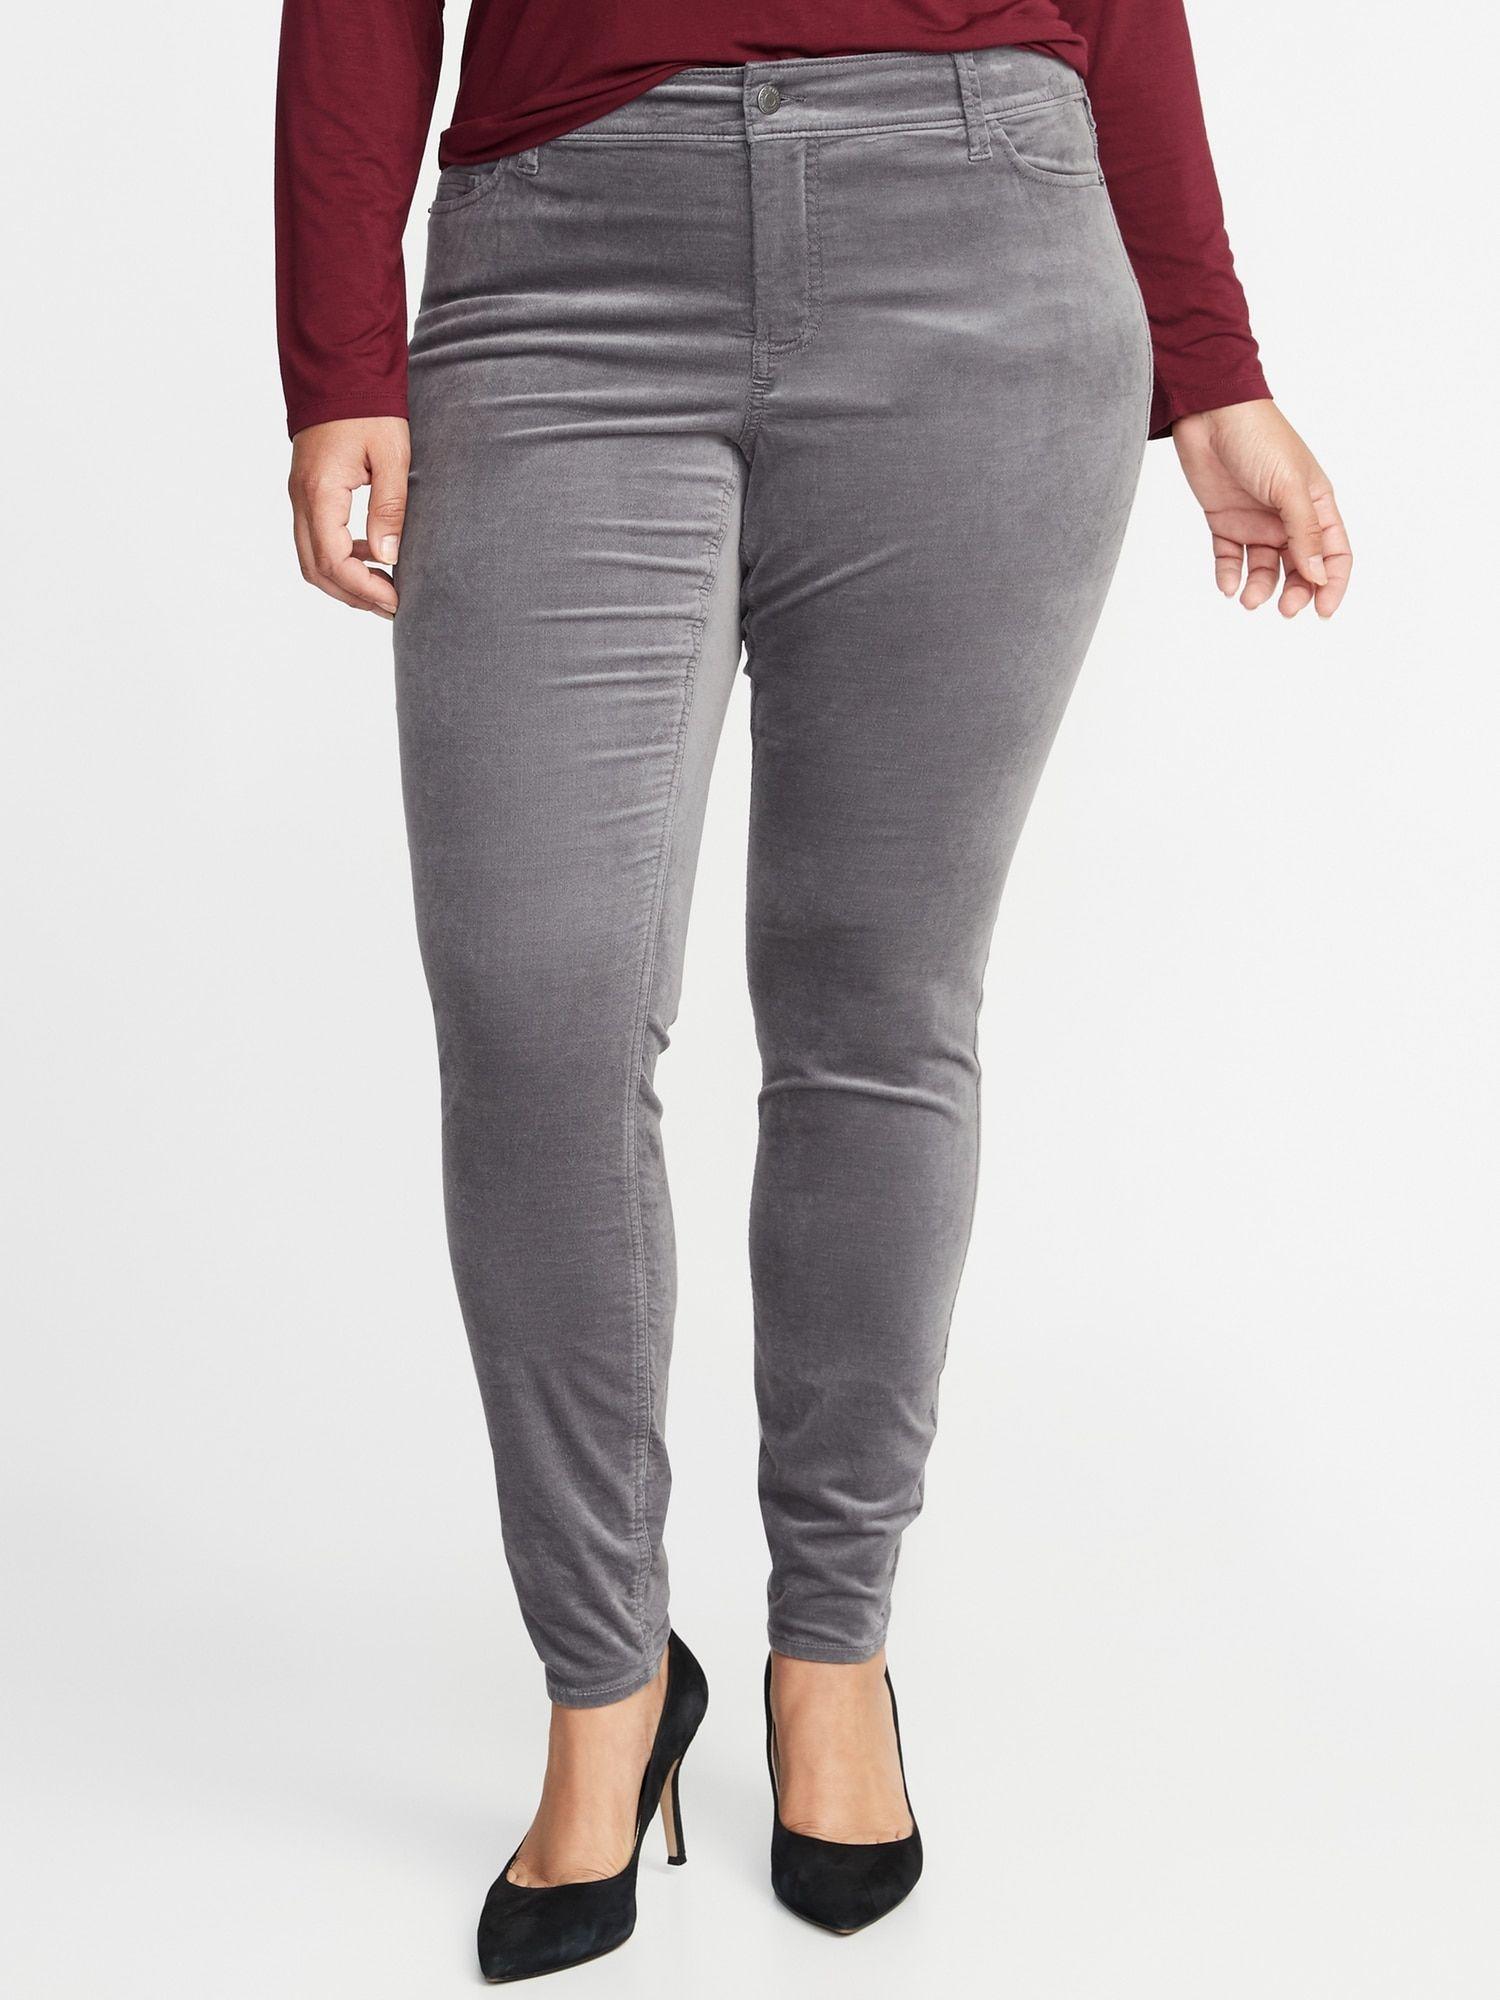 e5e7d0a8d1b High-Rise Secret-Slim Pockets Plus-Size Rockstar Velvet Pants | Old Navy